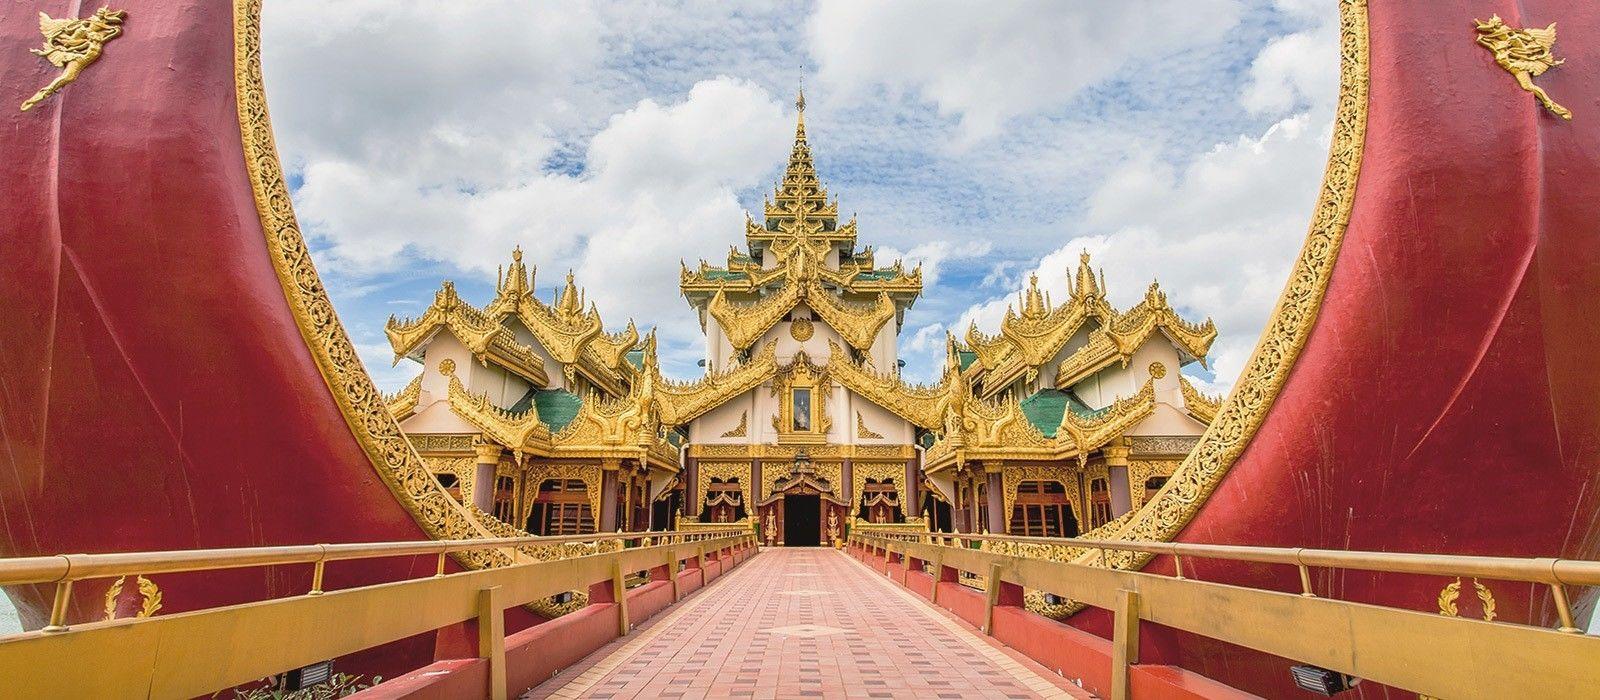 The Best of Myanmar Tour Trip 1